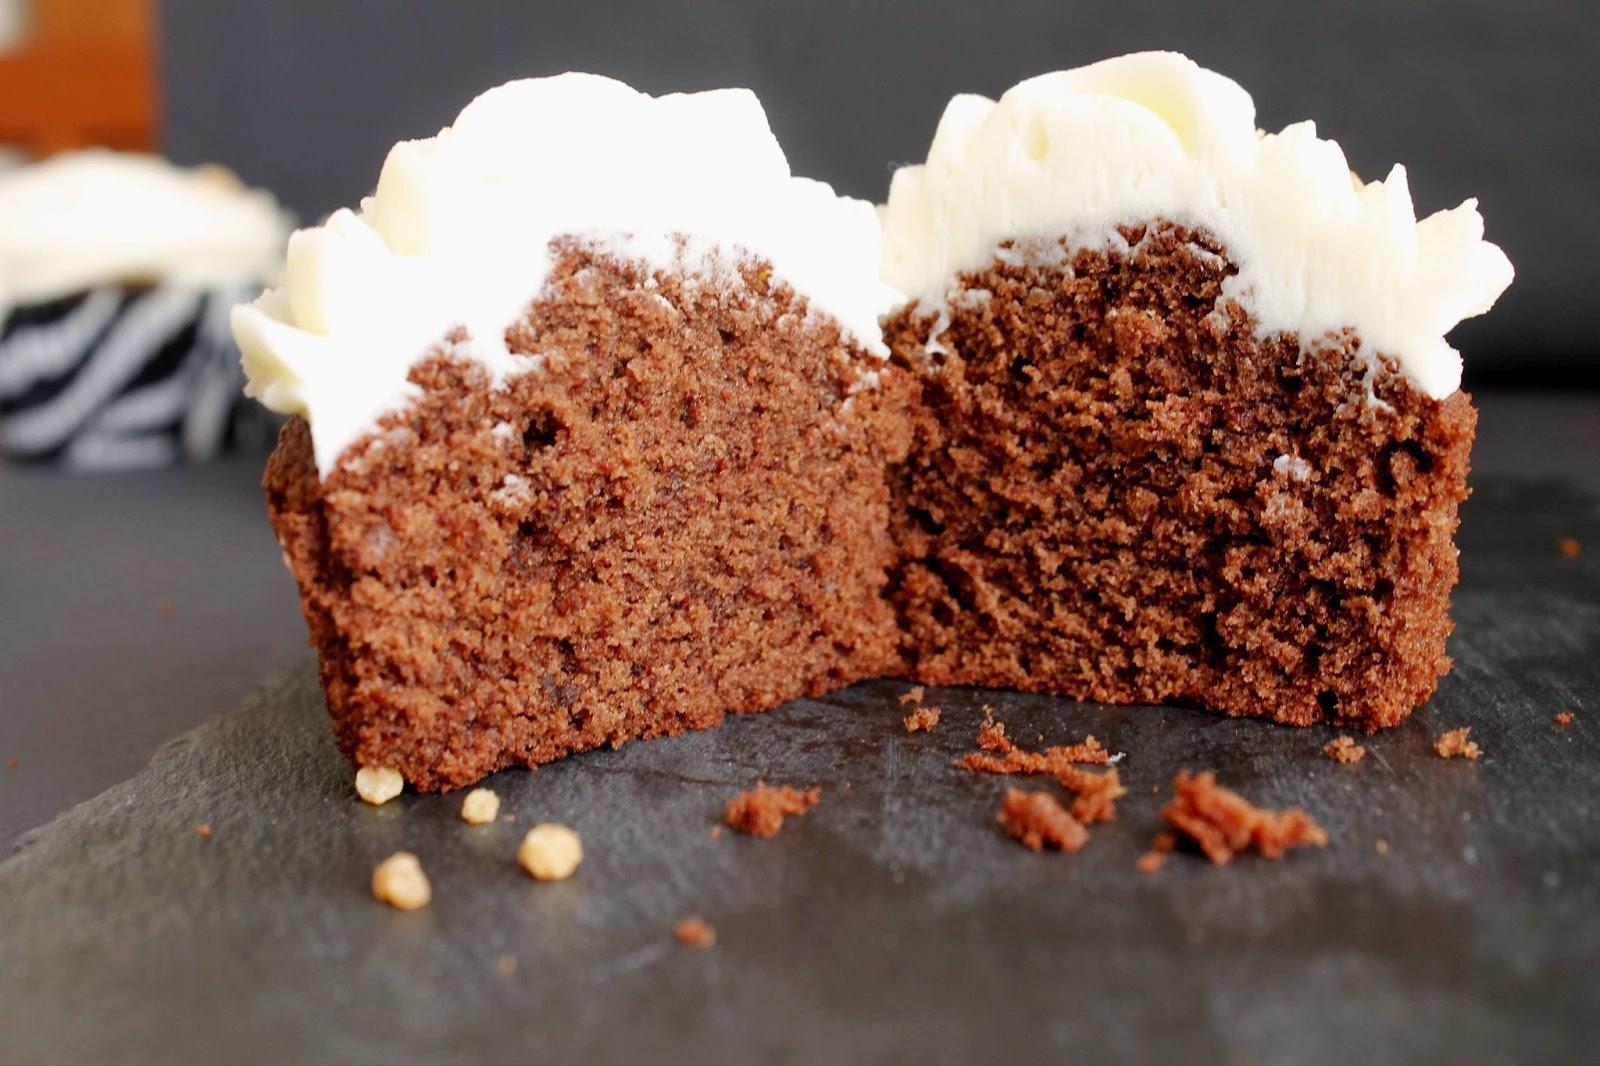 Receta de Cupcakes de chocolate y buttercream de crema de almendras